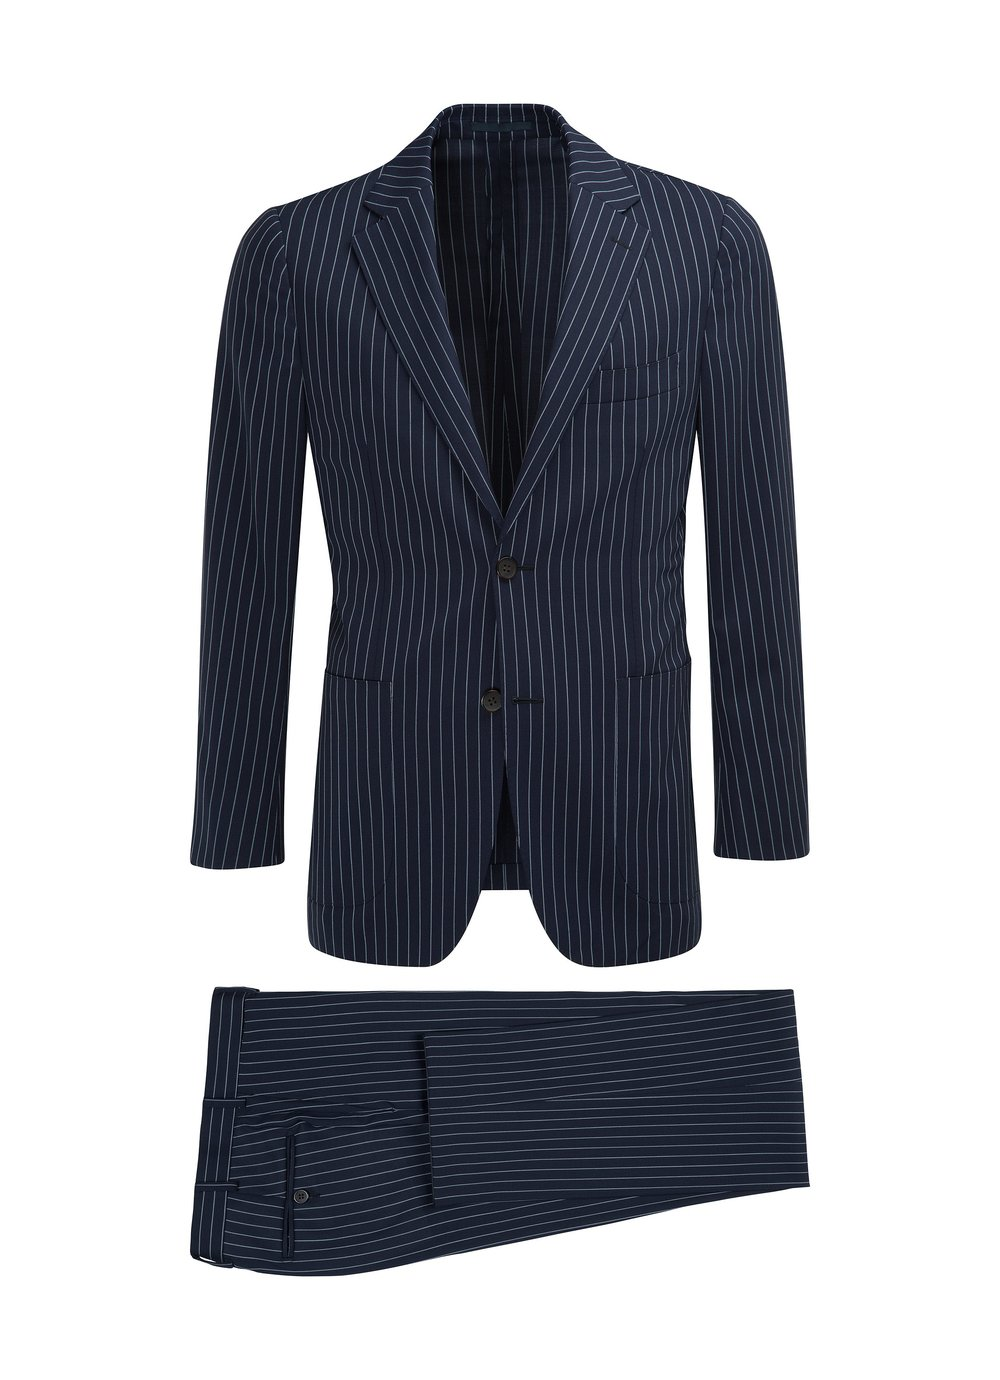 Suits_Blue_Stripe_Havana_P5112_Suitsupply_Online_Store_5.jpg